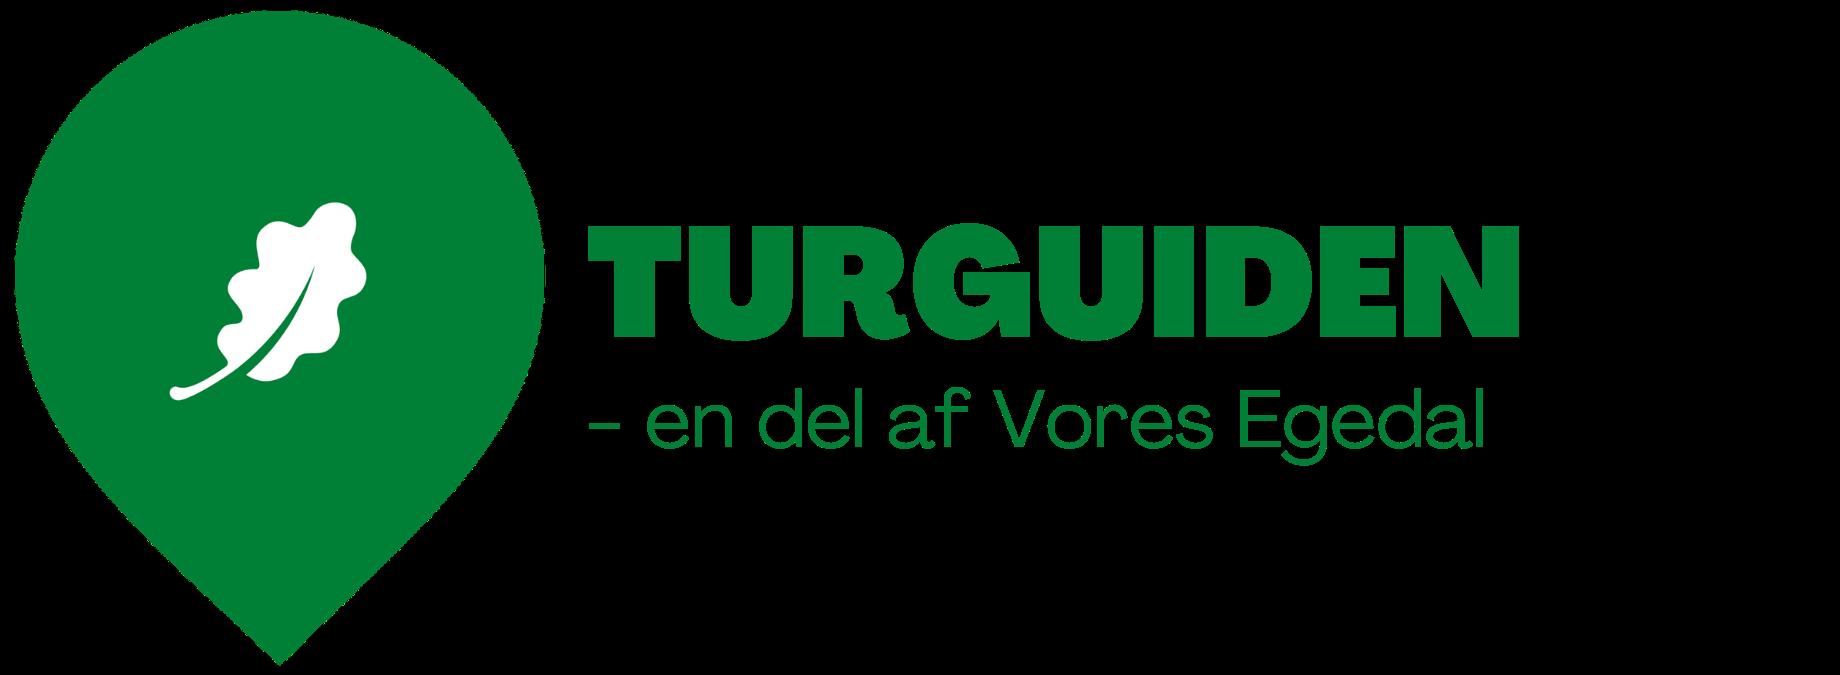 Turguiden - Vores Egedal